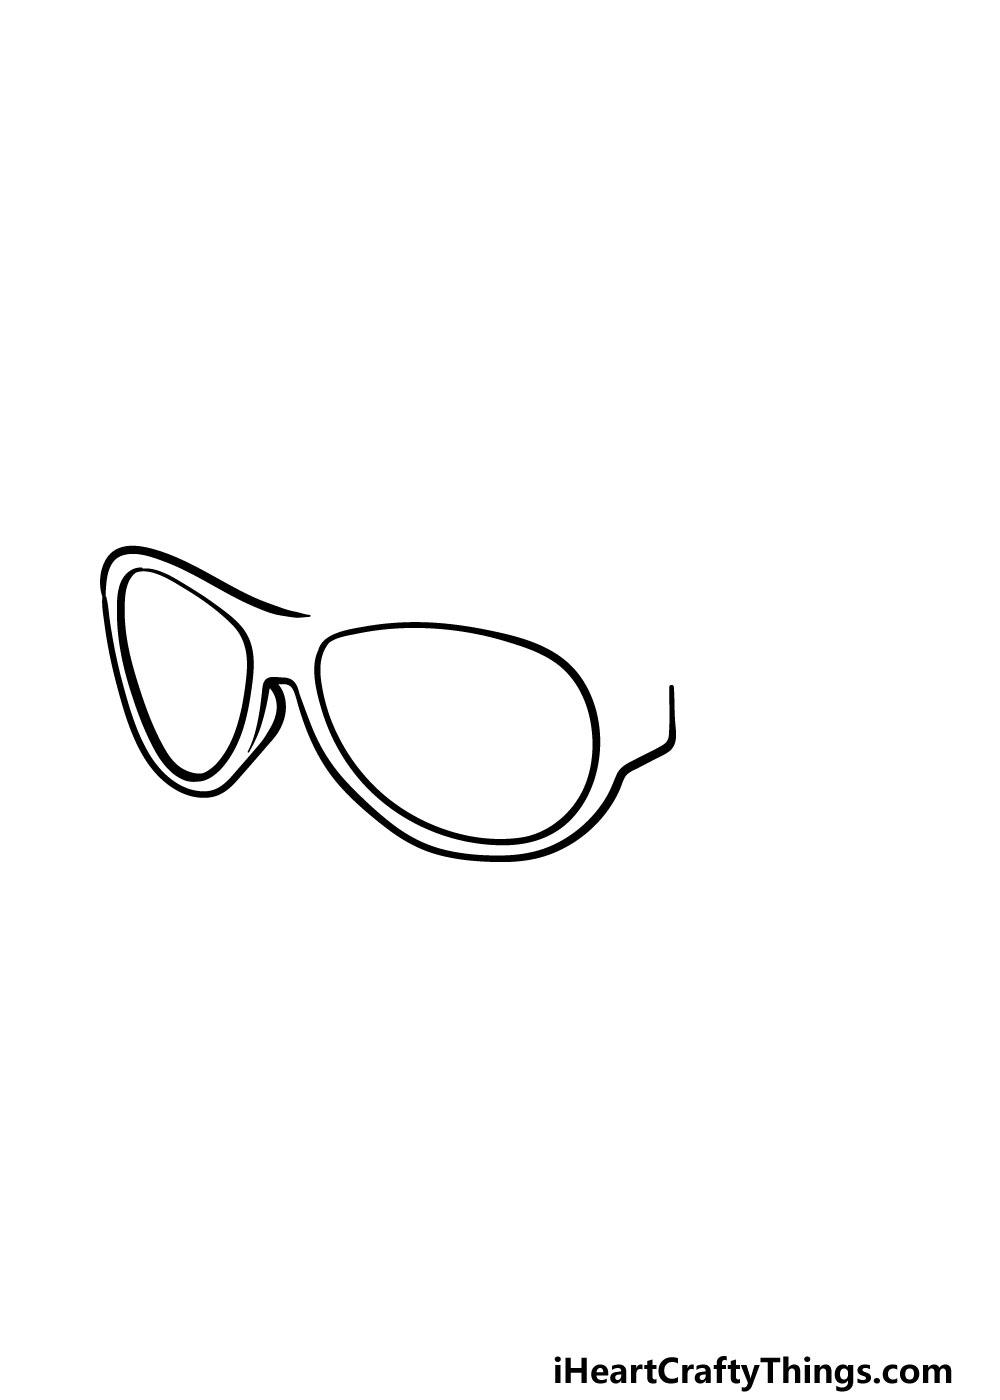 drawing sunglasses step 3